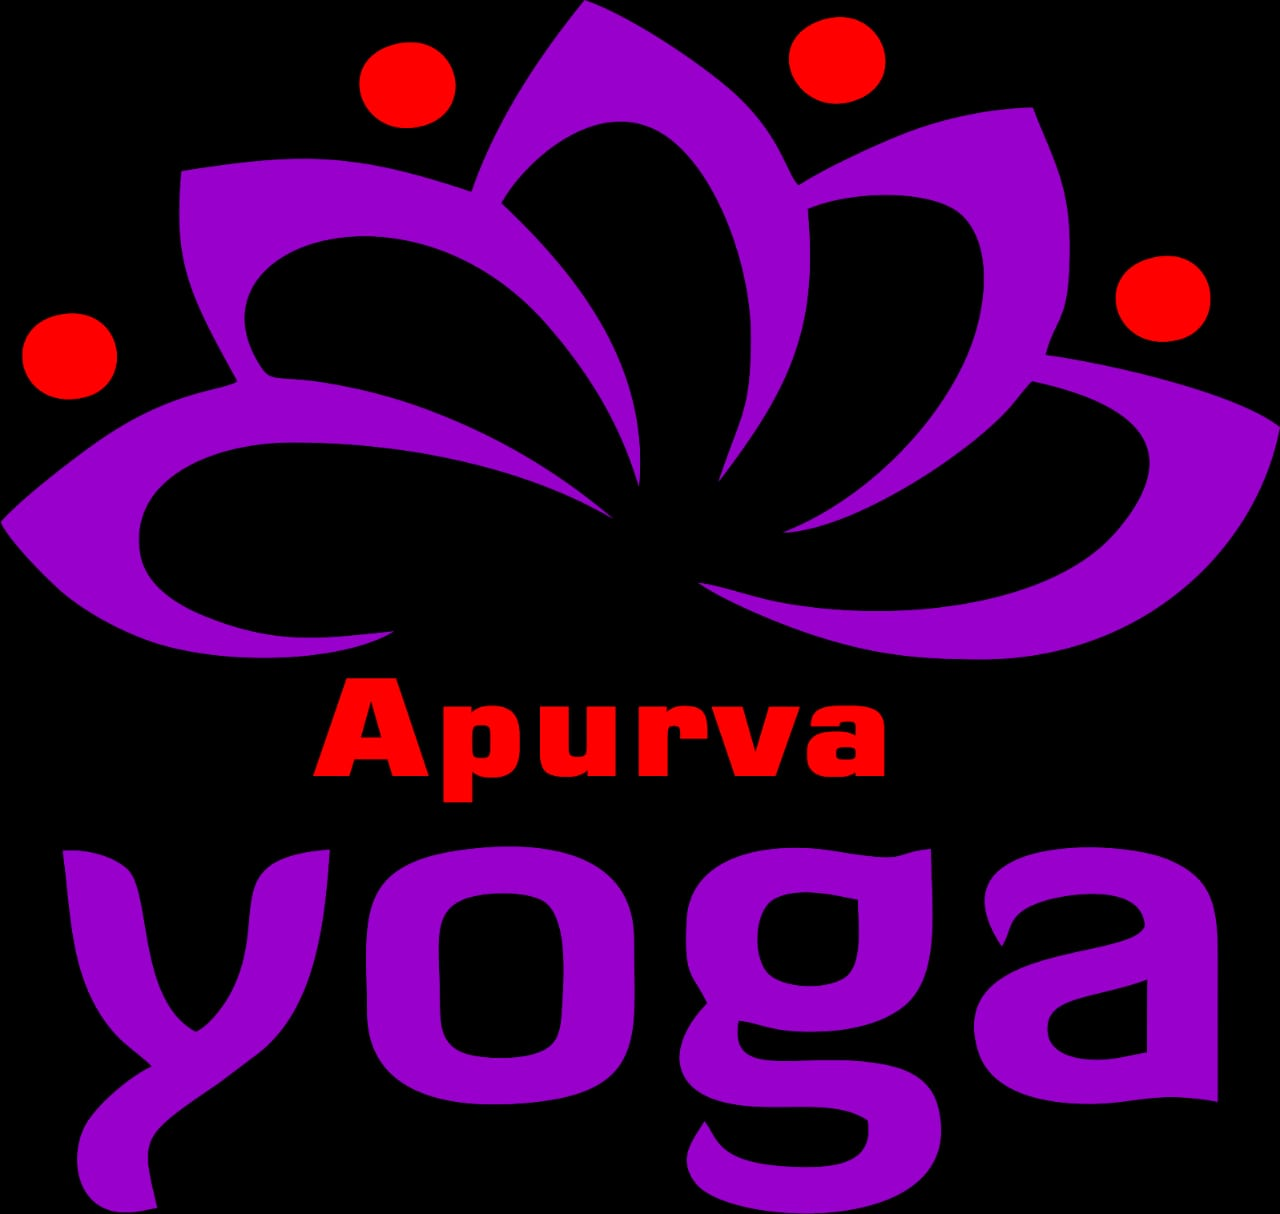 Apurva Yoga